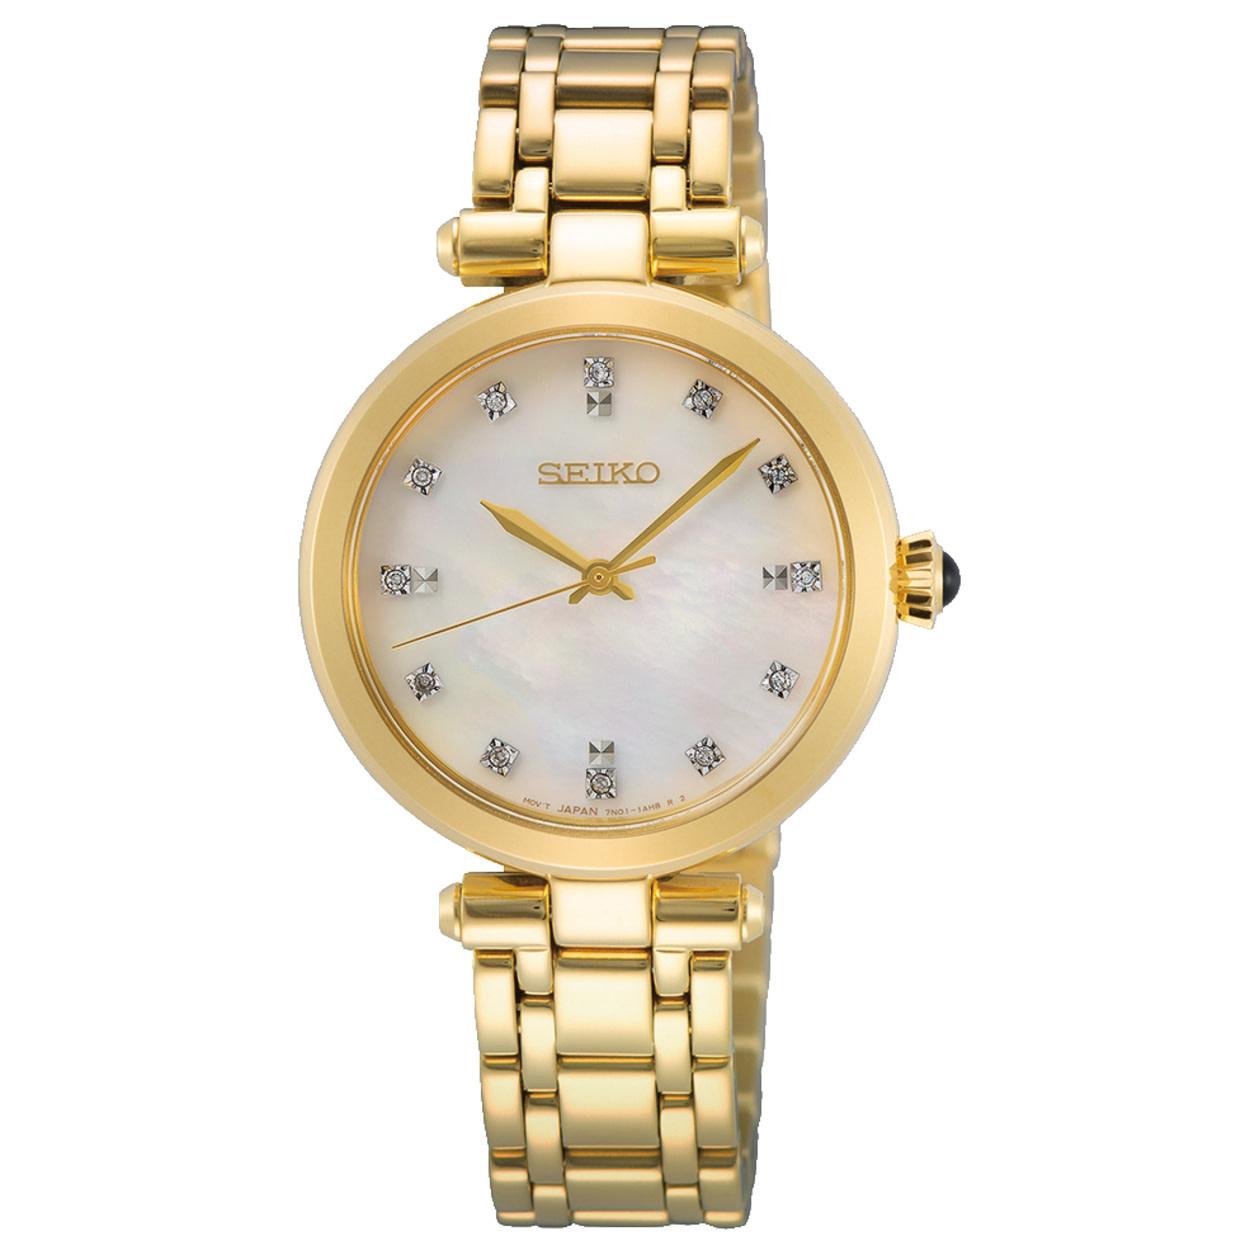 Seiko Seiko dames horloge SRZ536P1